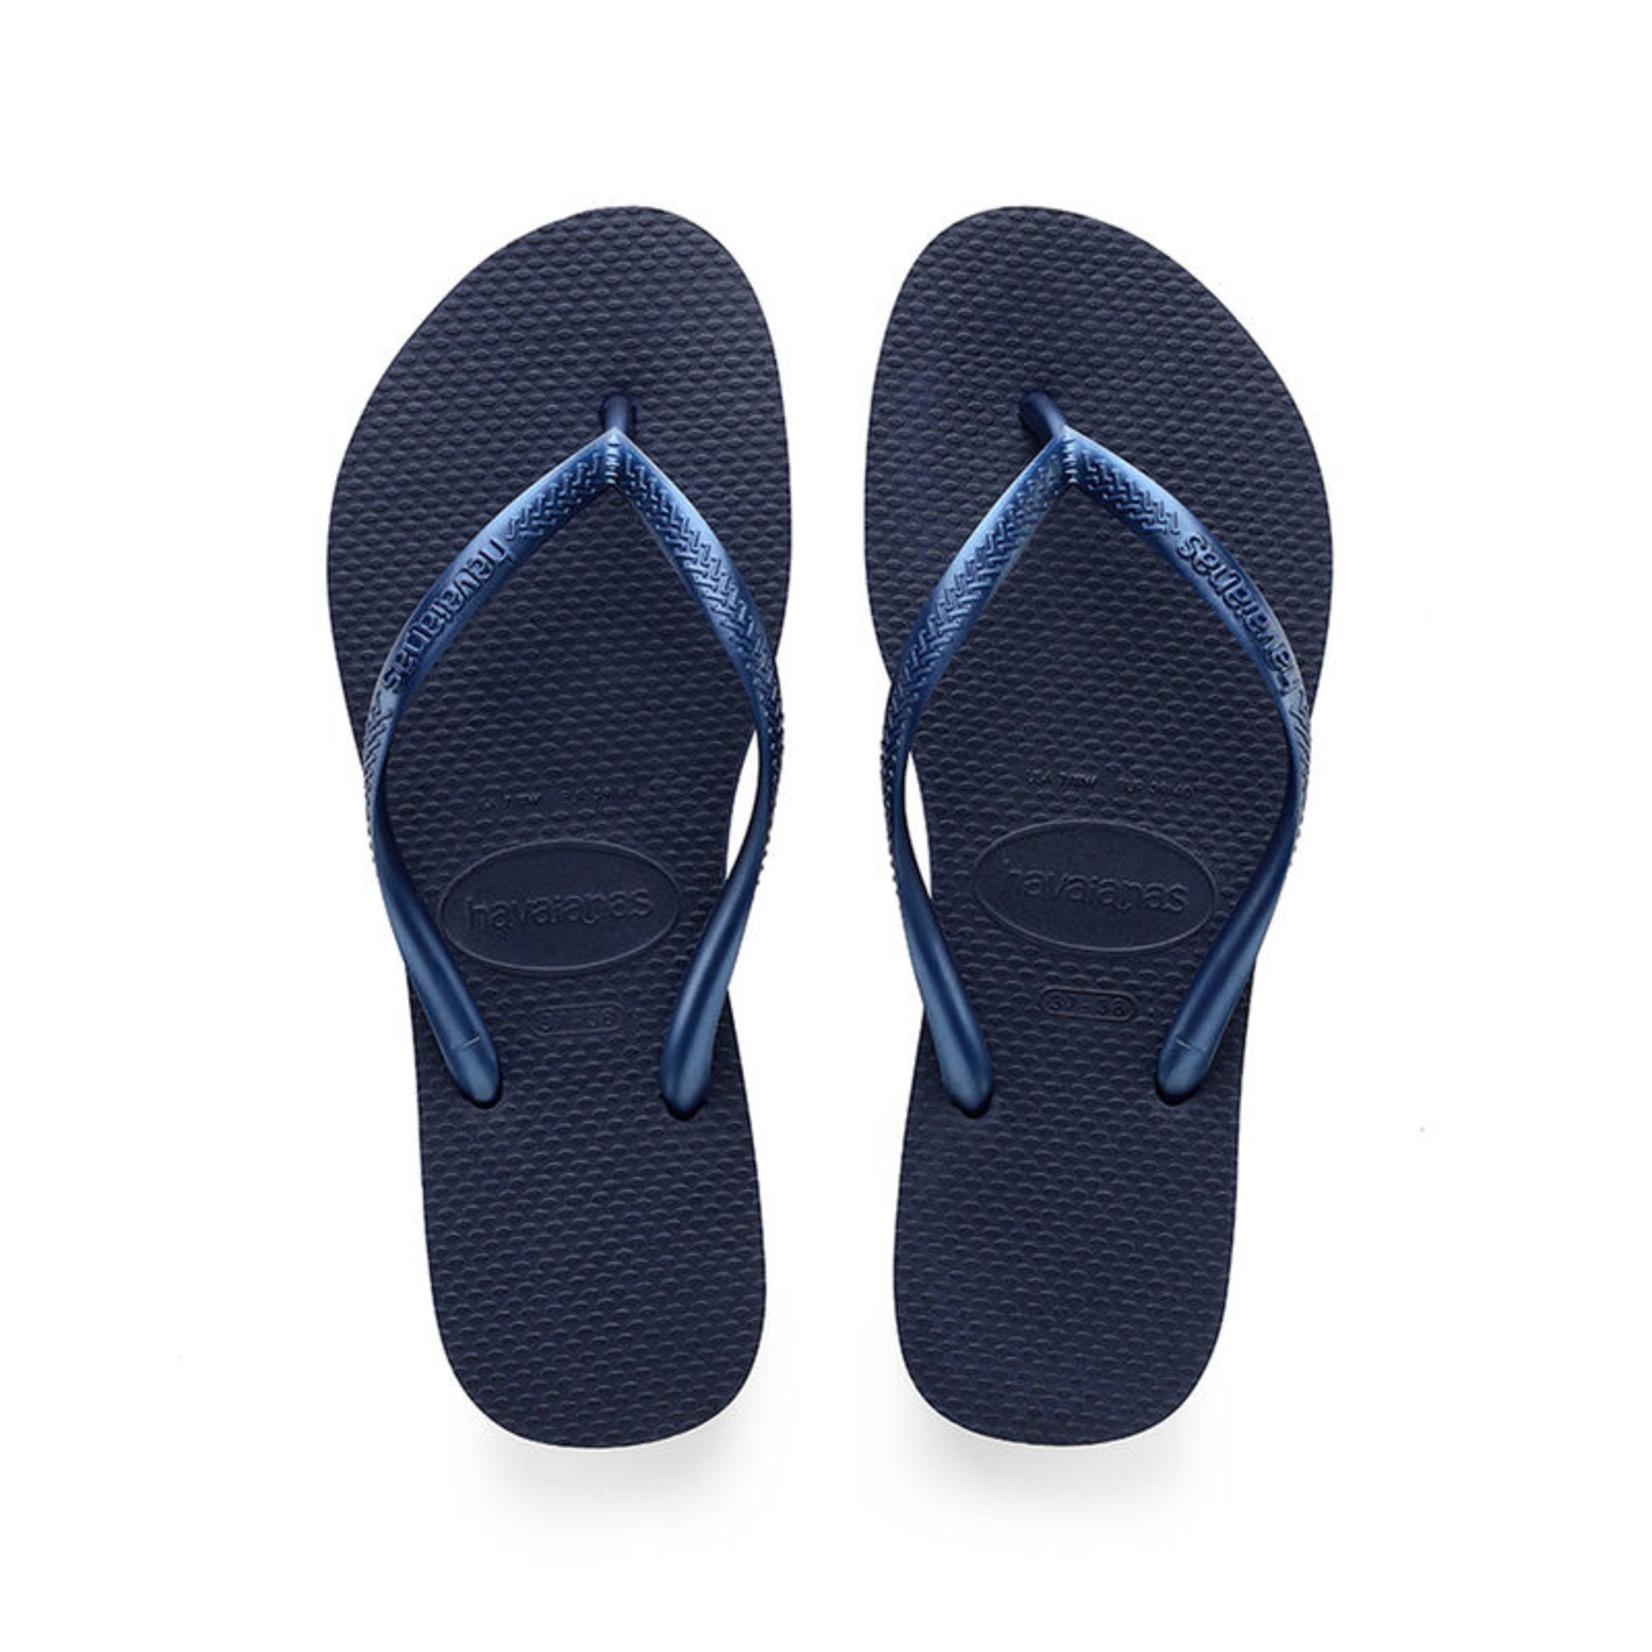 Havaianas Havaianas Slim Sandal Navy Blue FlipFlops